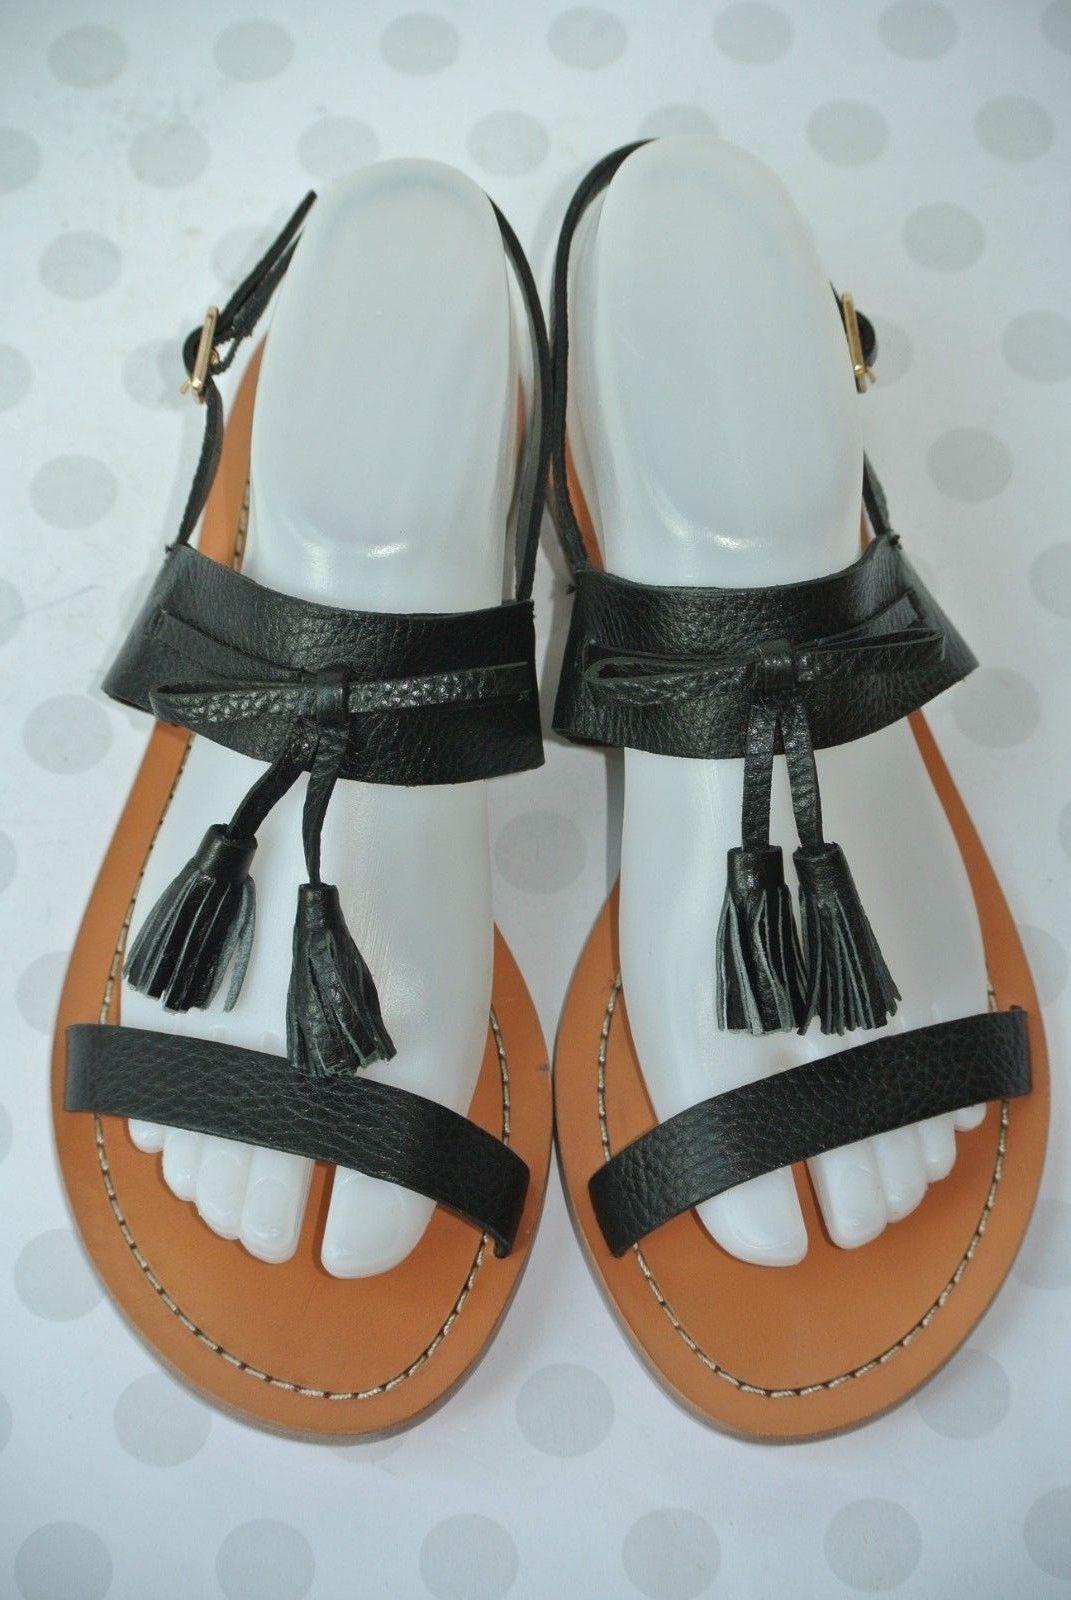 d4bfc2c4ff9c NEW Kate Spade New York Carlita Womens Sz 8 Black Leather Tassel Strappy  Sandals